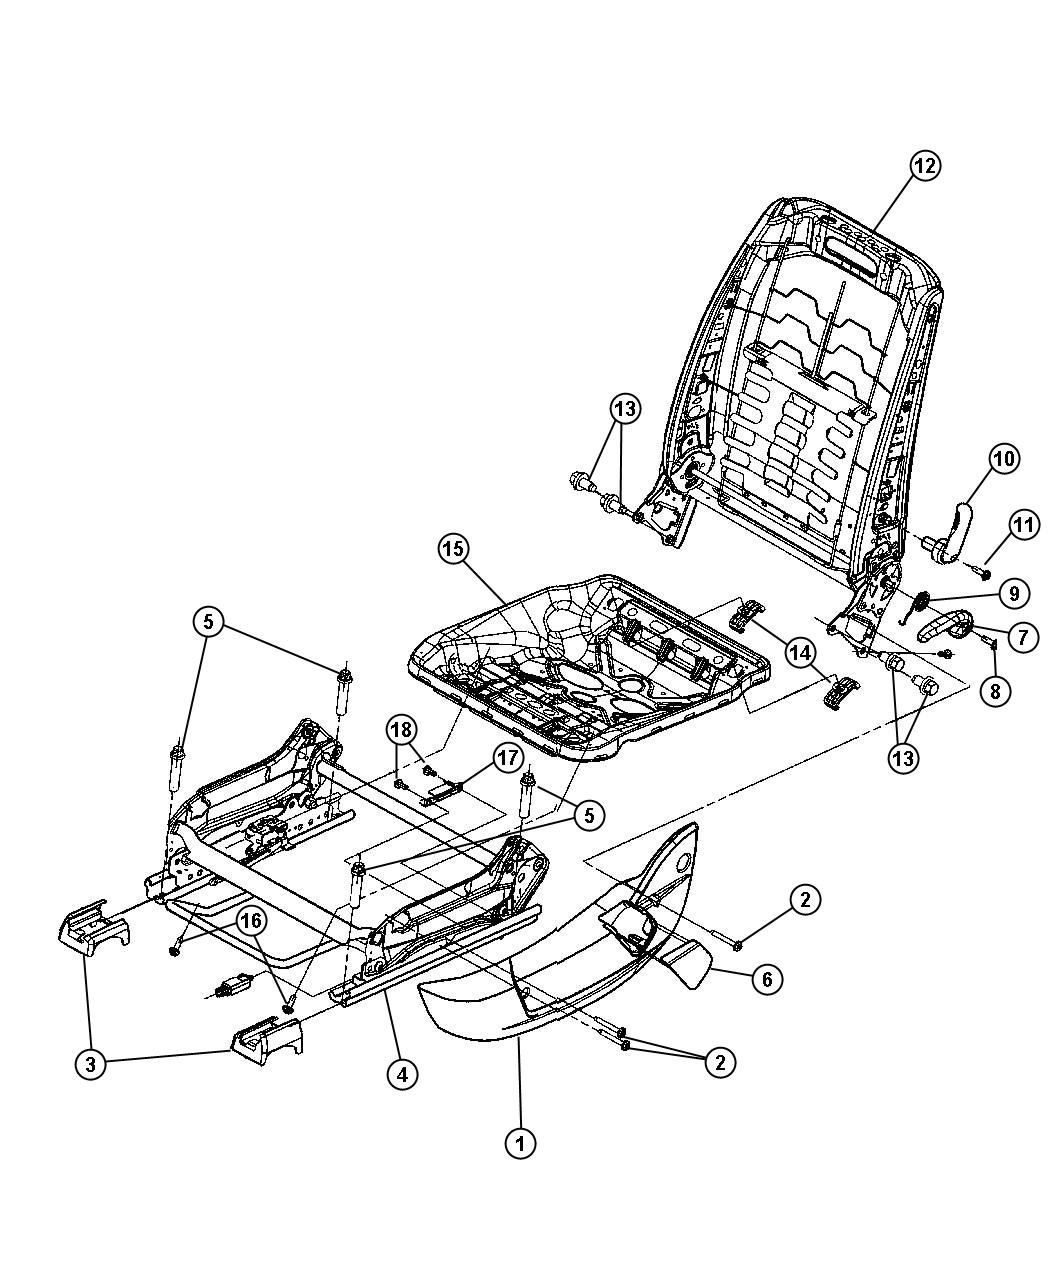 Dodge Charger Bolt, retainer. Body iso mounting bolt-frt